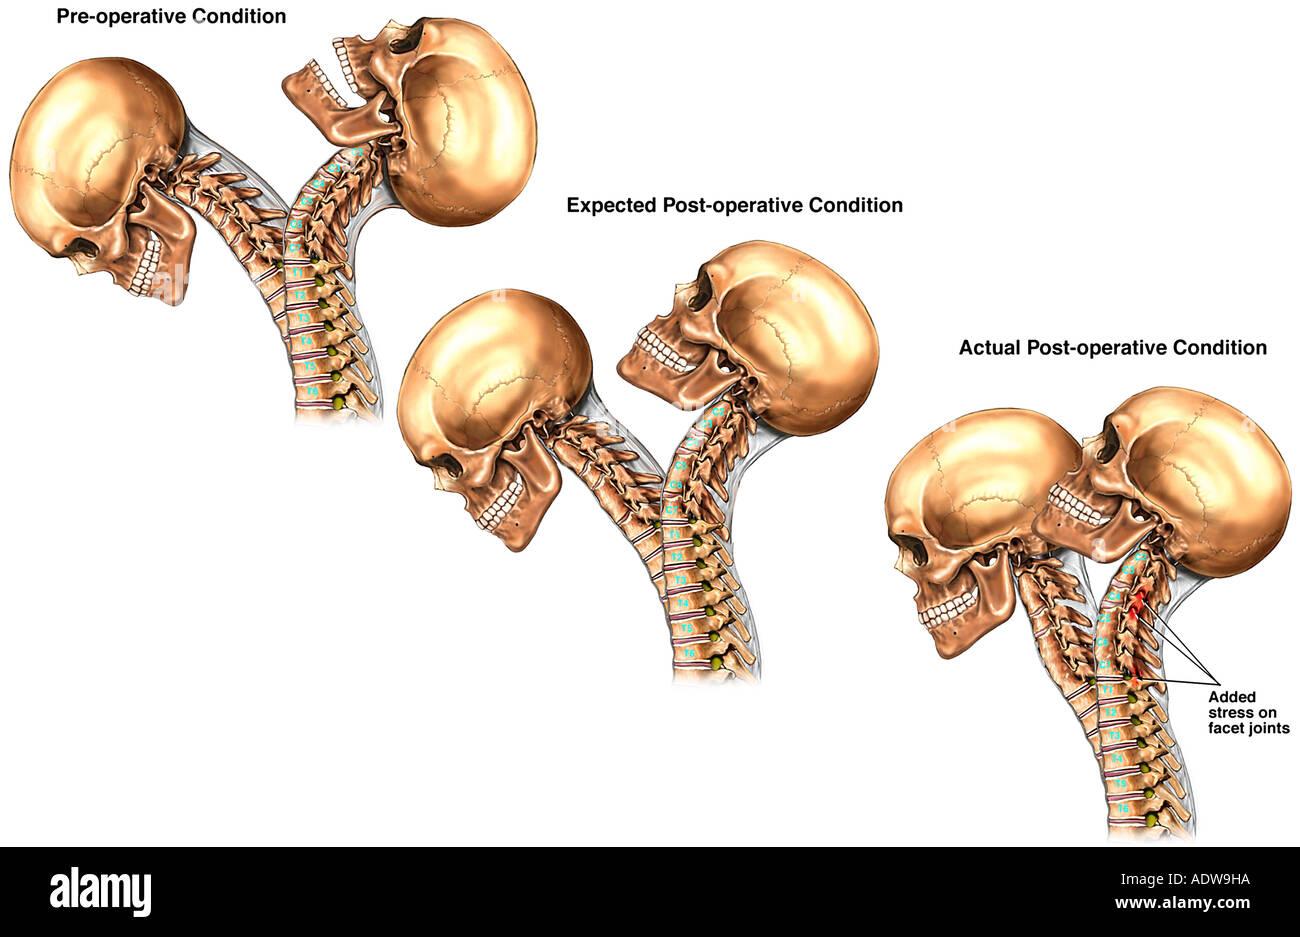 Decreased Post operative Range of Motion in Cervical Spine - Stock Image